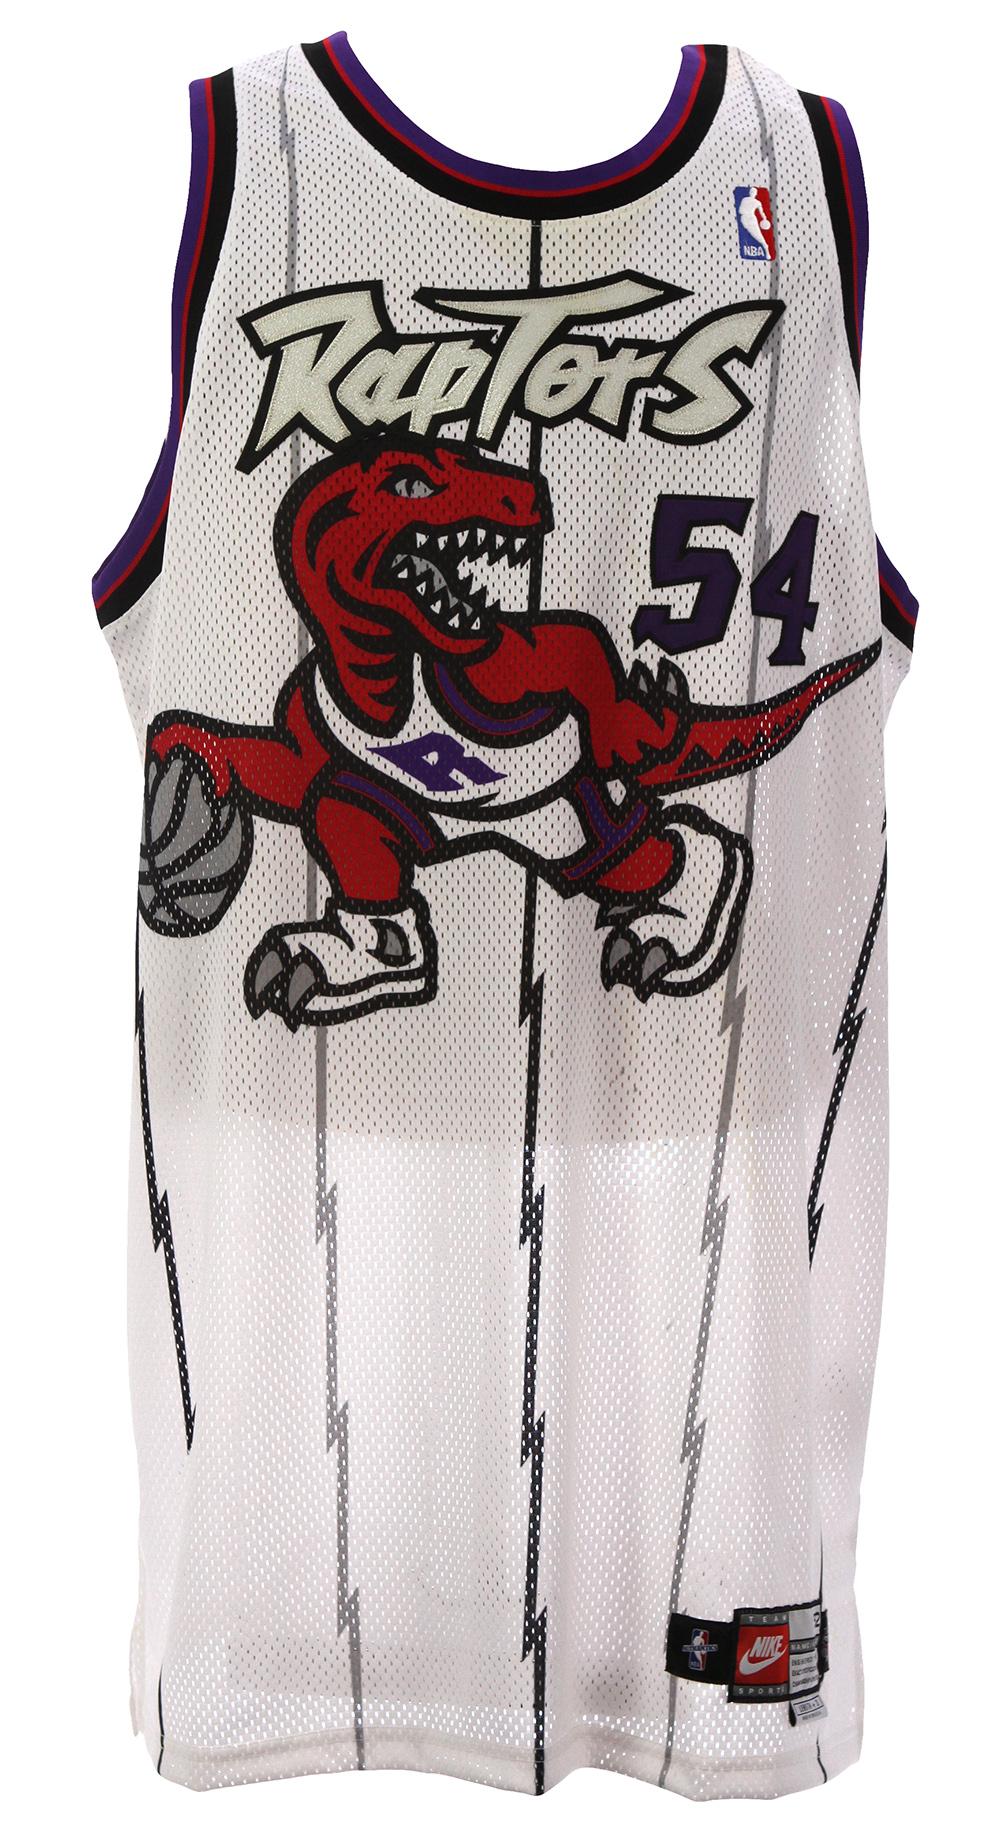 sale retailer cfeb1 94aca Lot Detail - 1997-1998 Popeye Jones Toronto Raptors ...